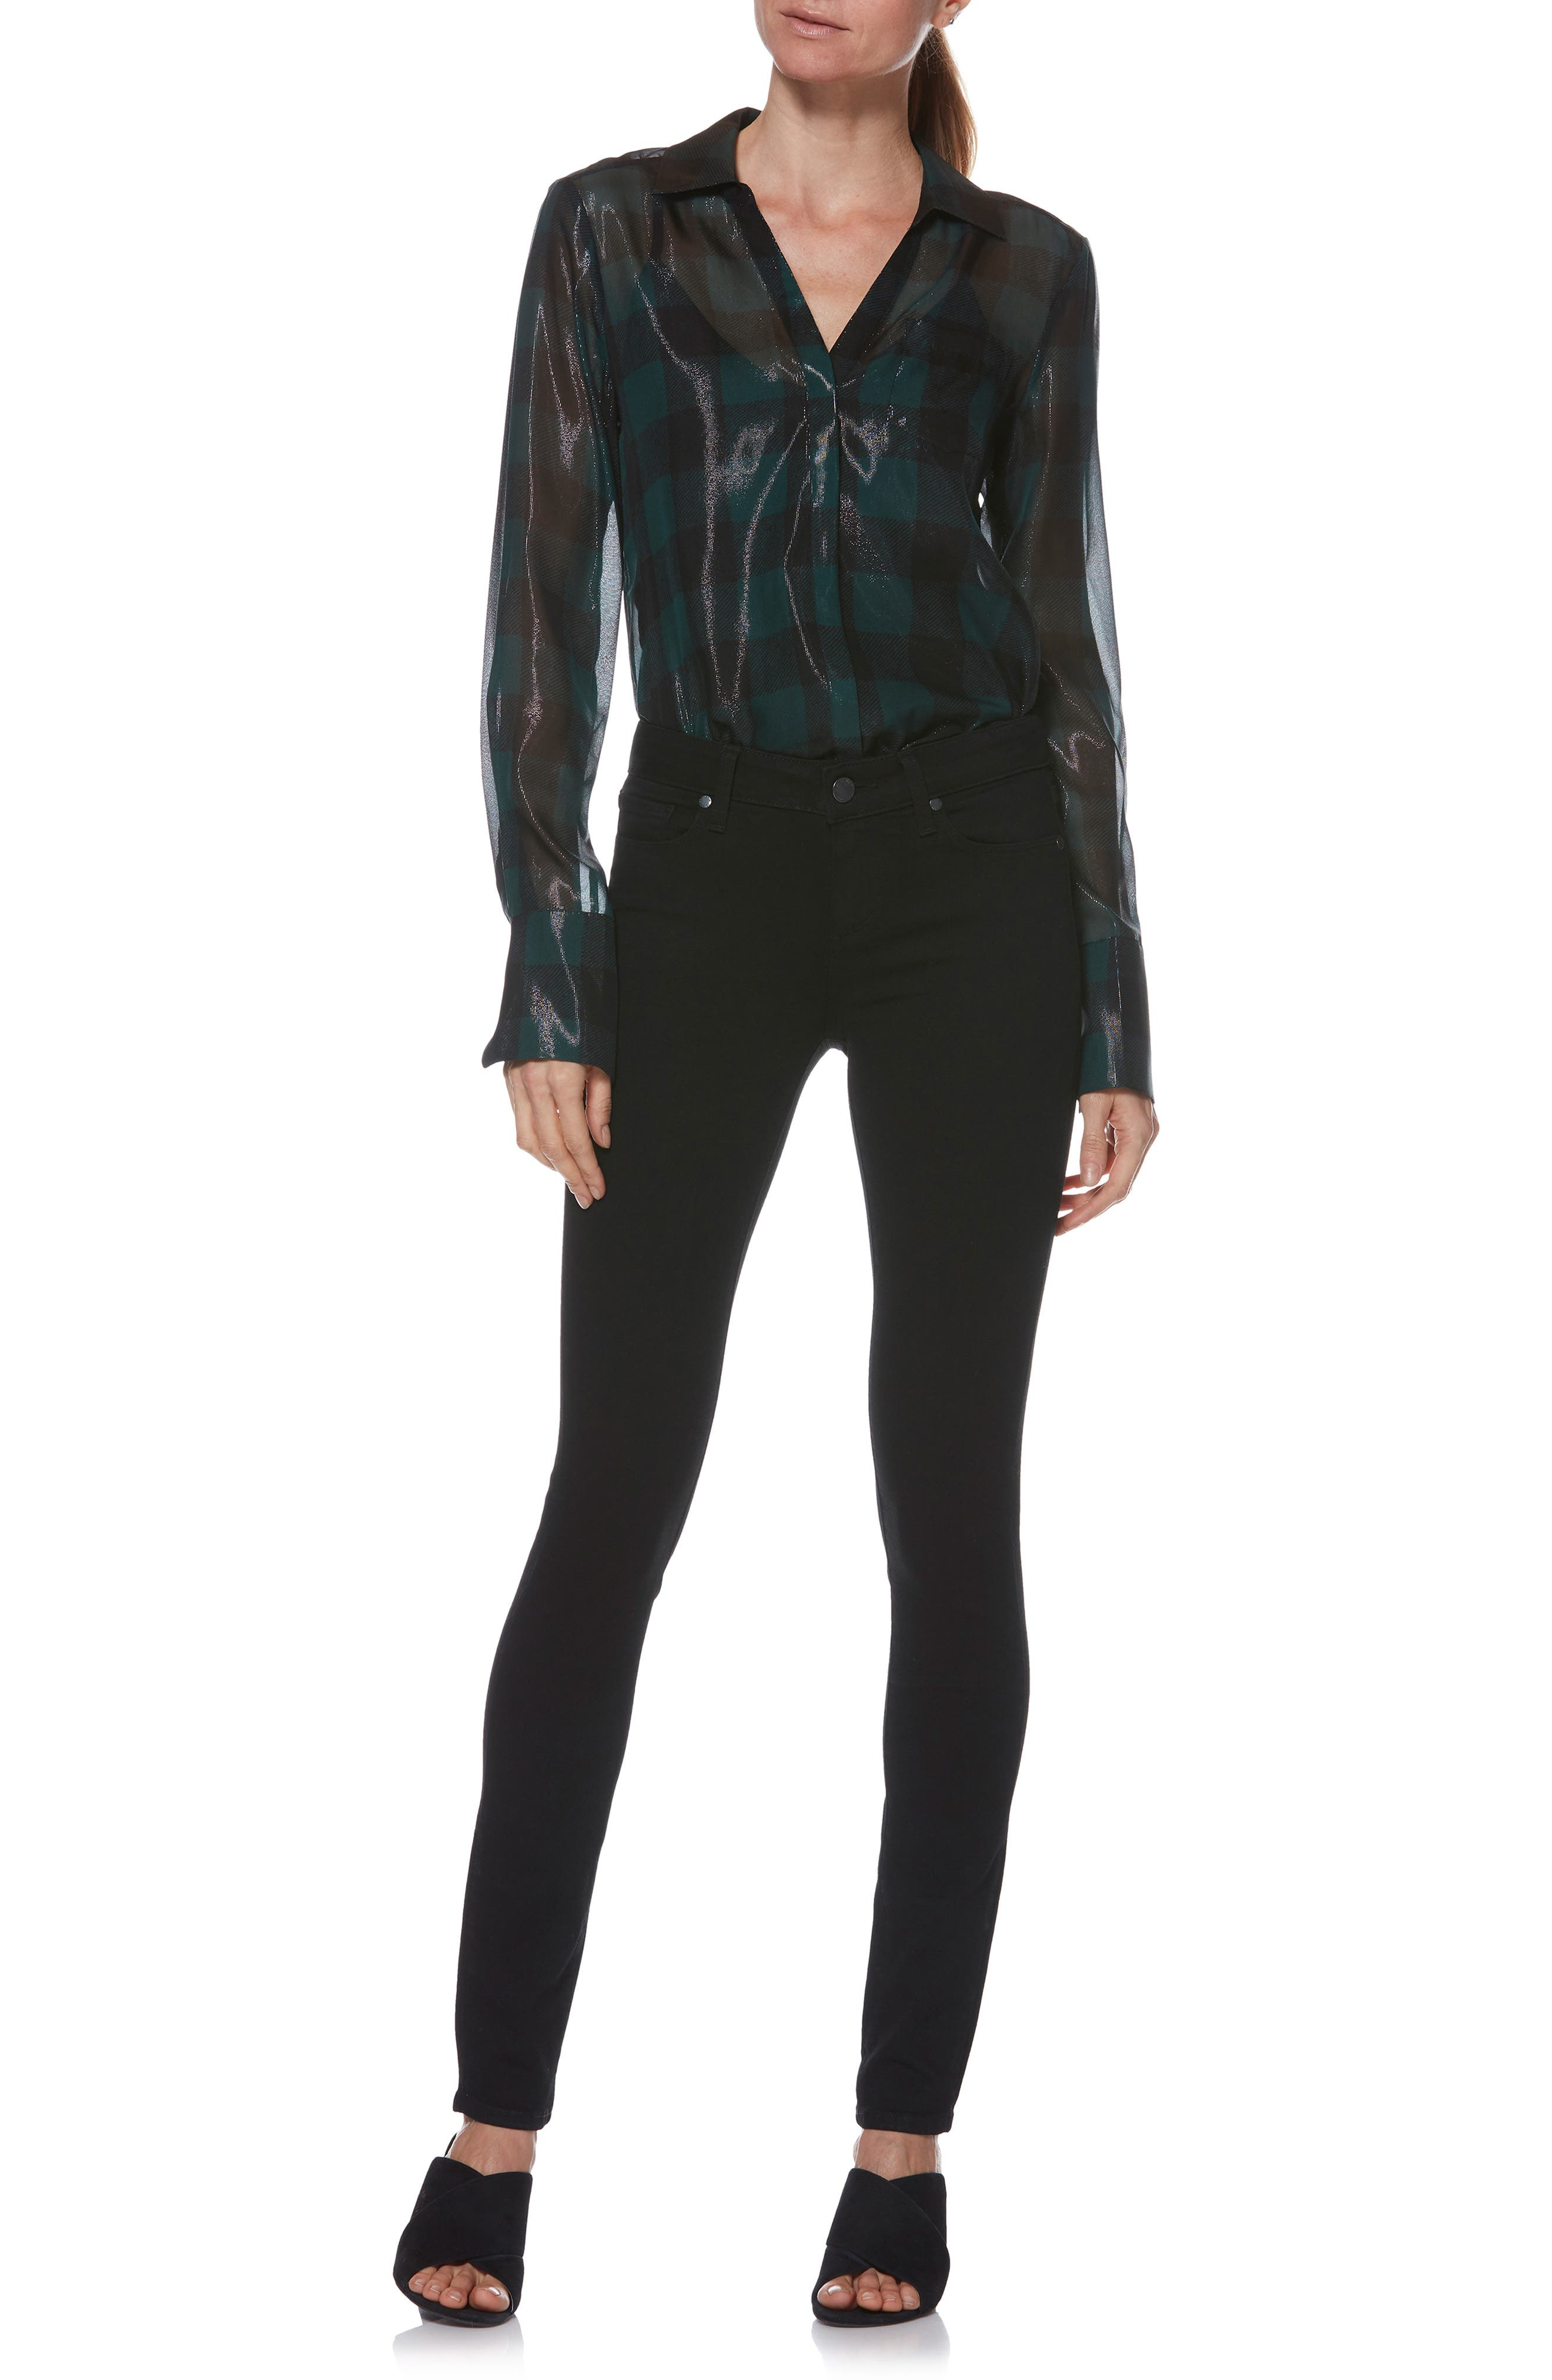 Transcend - Skyline Skinny Jeans,                             Alternate thumbnail 14, color,                             BLACK SHADOW